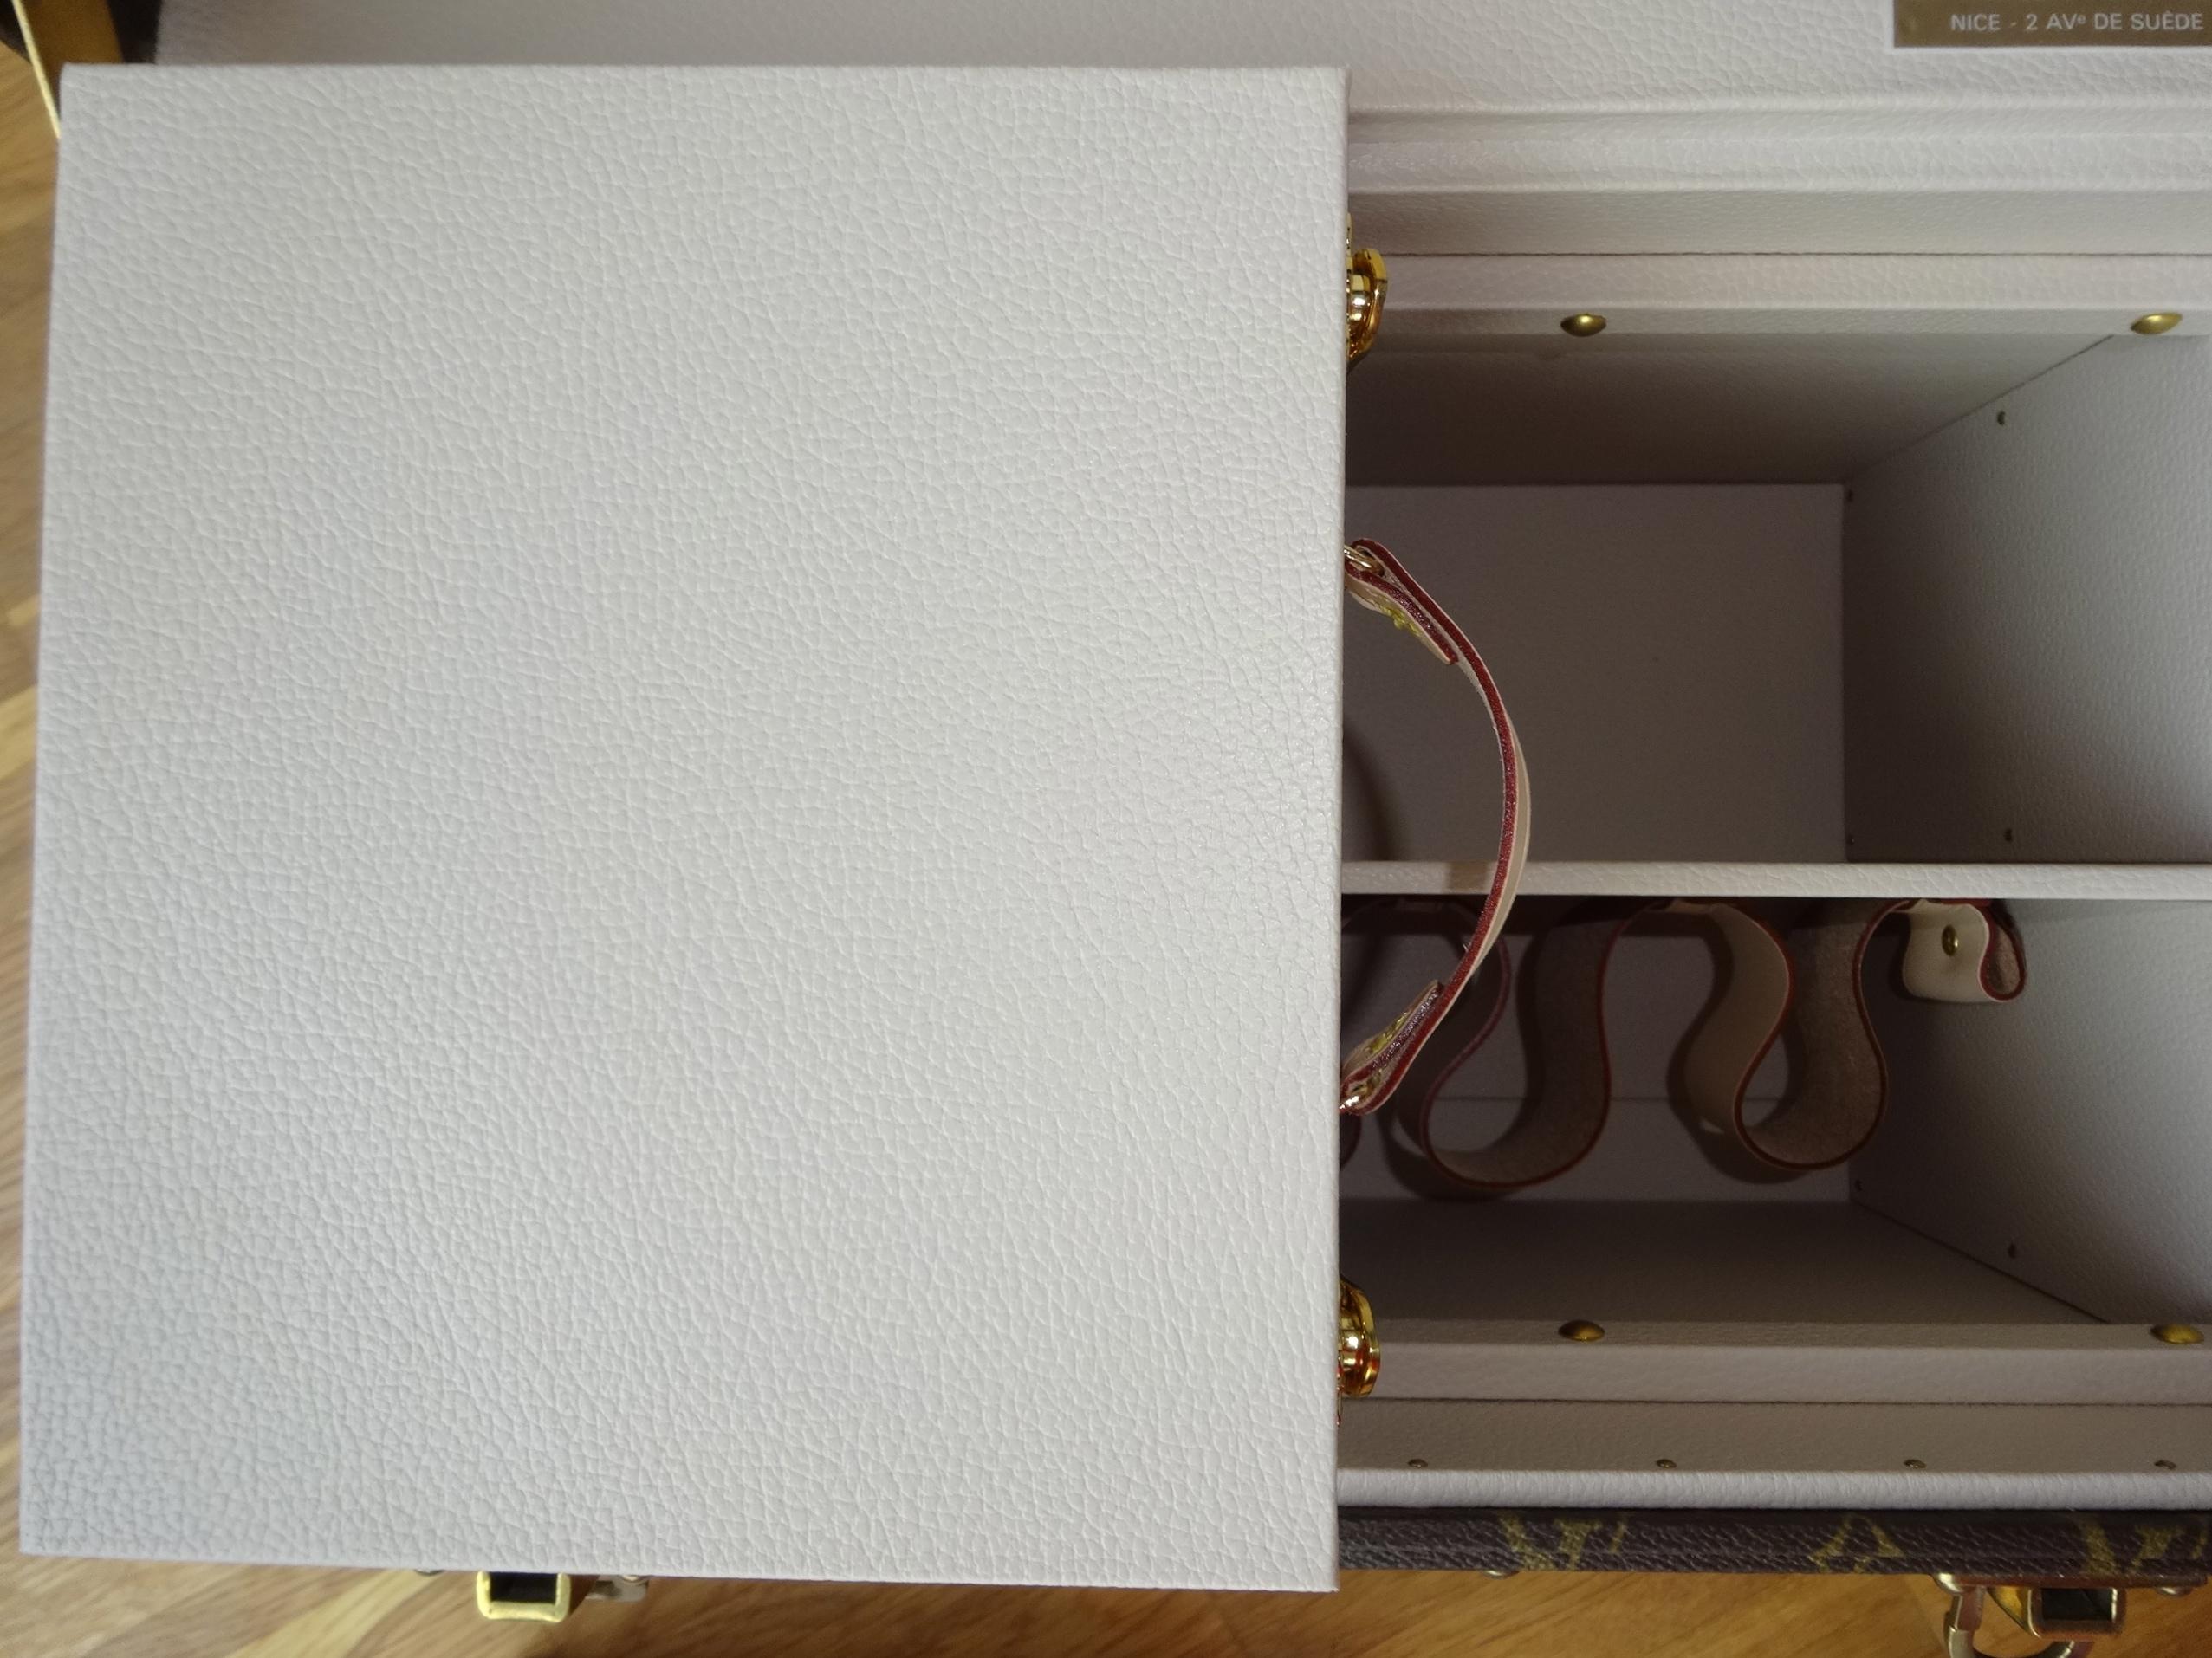 inside - Louis Vuitton Boite Pharmacie - innen